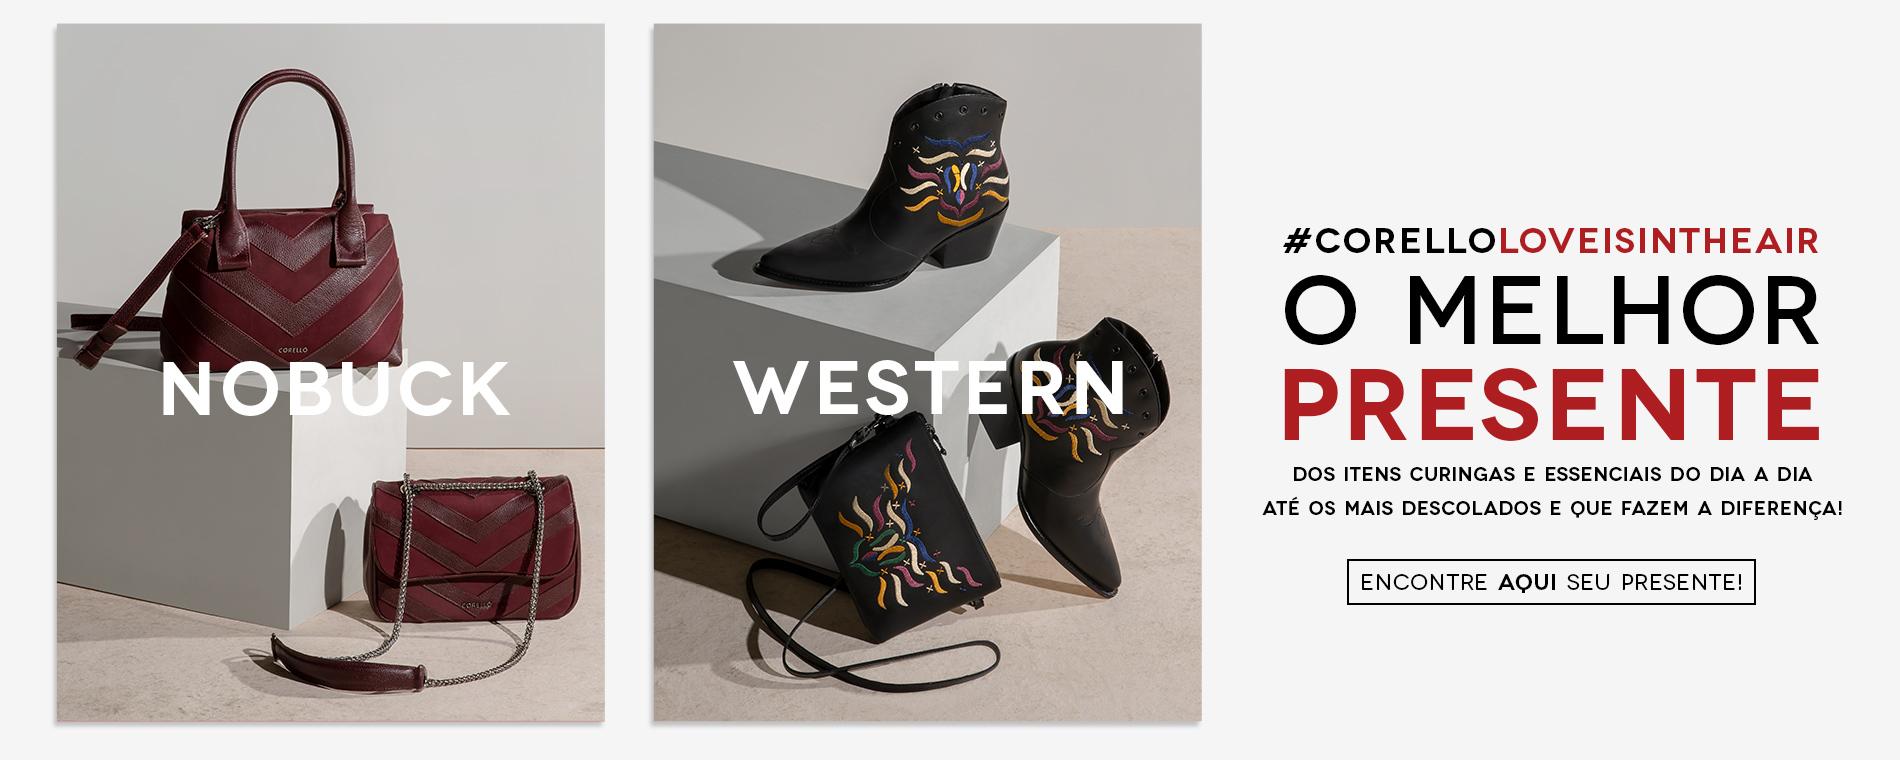 020ac8cb8 Sapatos Femininos, Bolsas e Acessórios | Corello